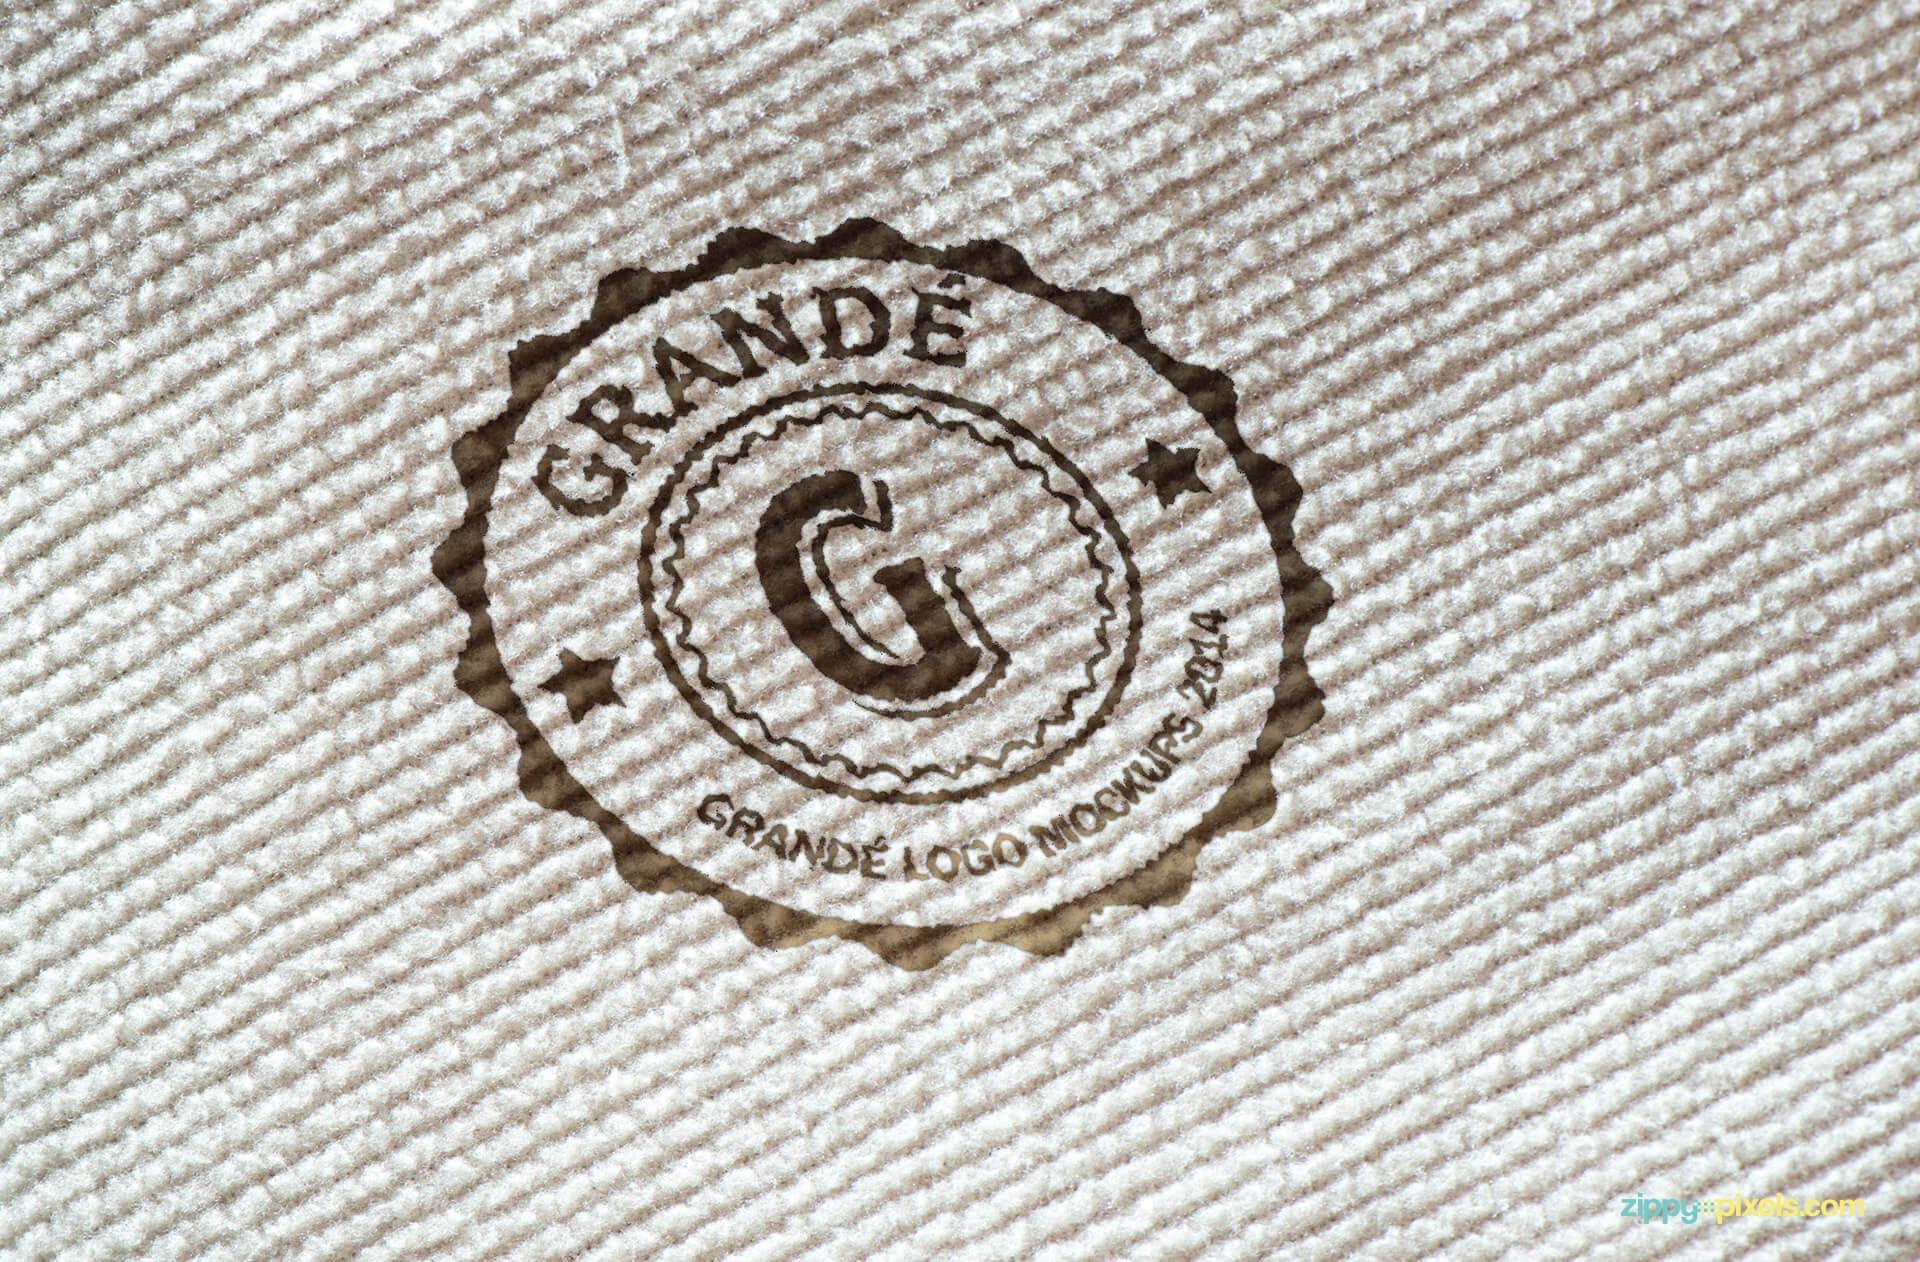 Mockup of Printed Logo on White Carpet